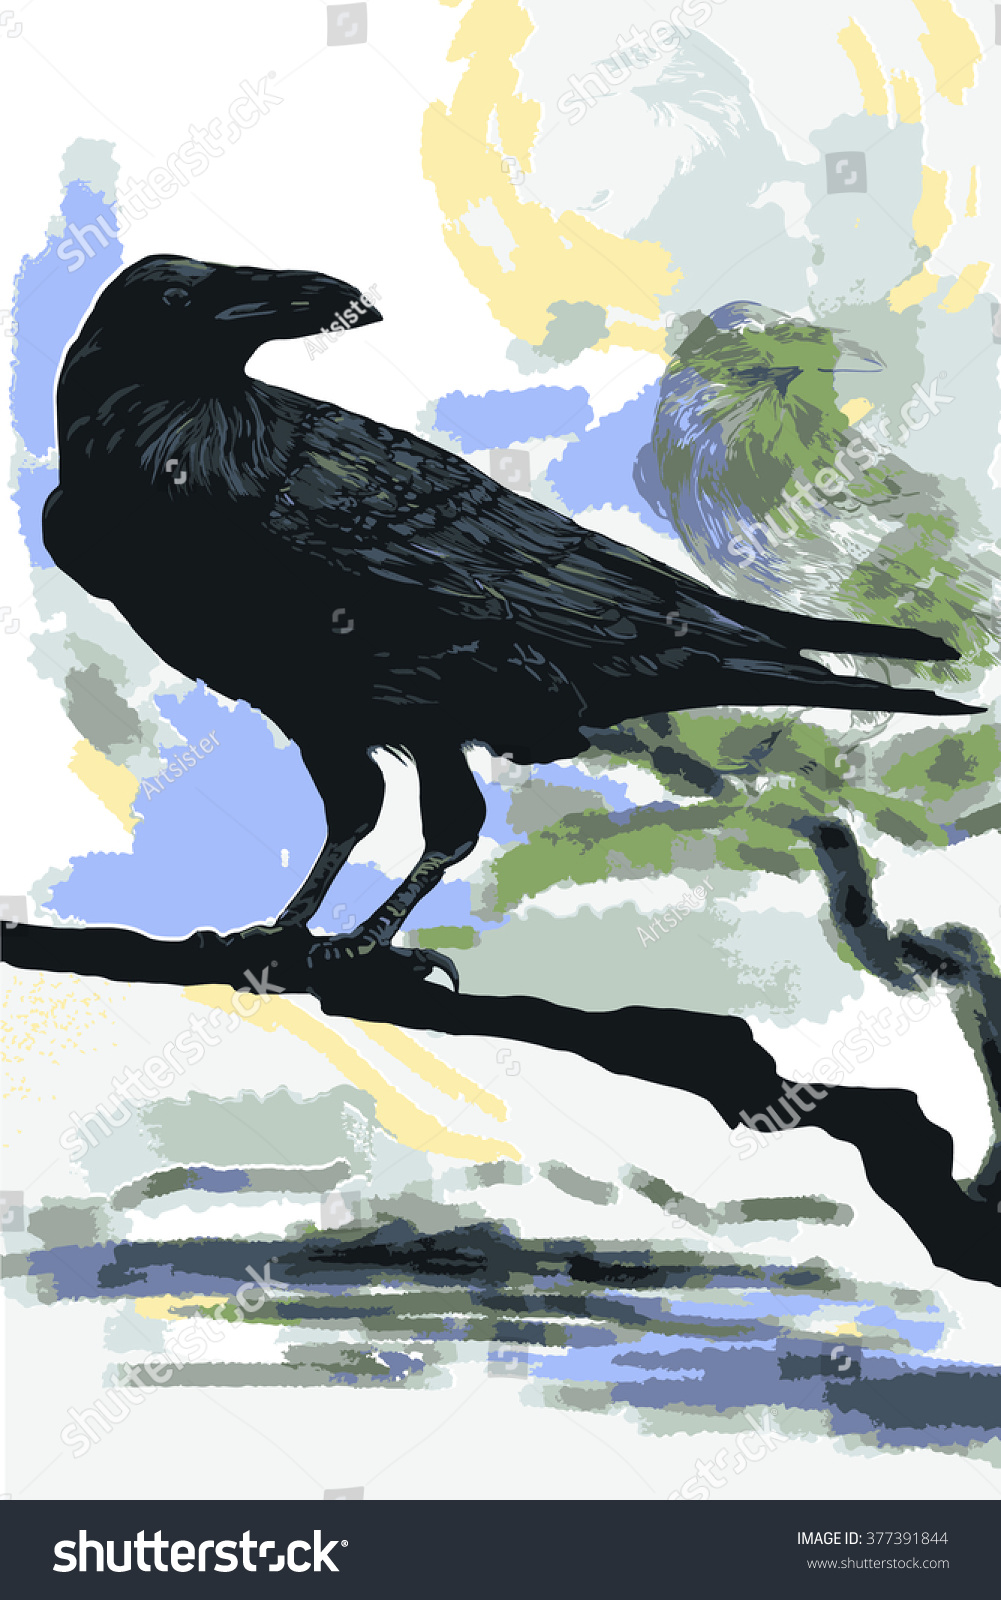 Digital Painting Raven Symbol Relationship Between Stock